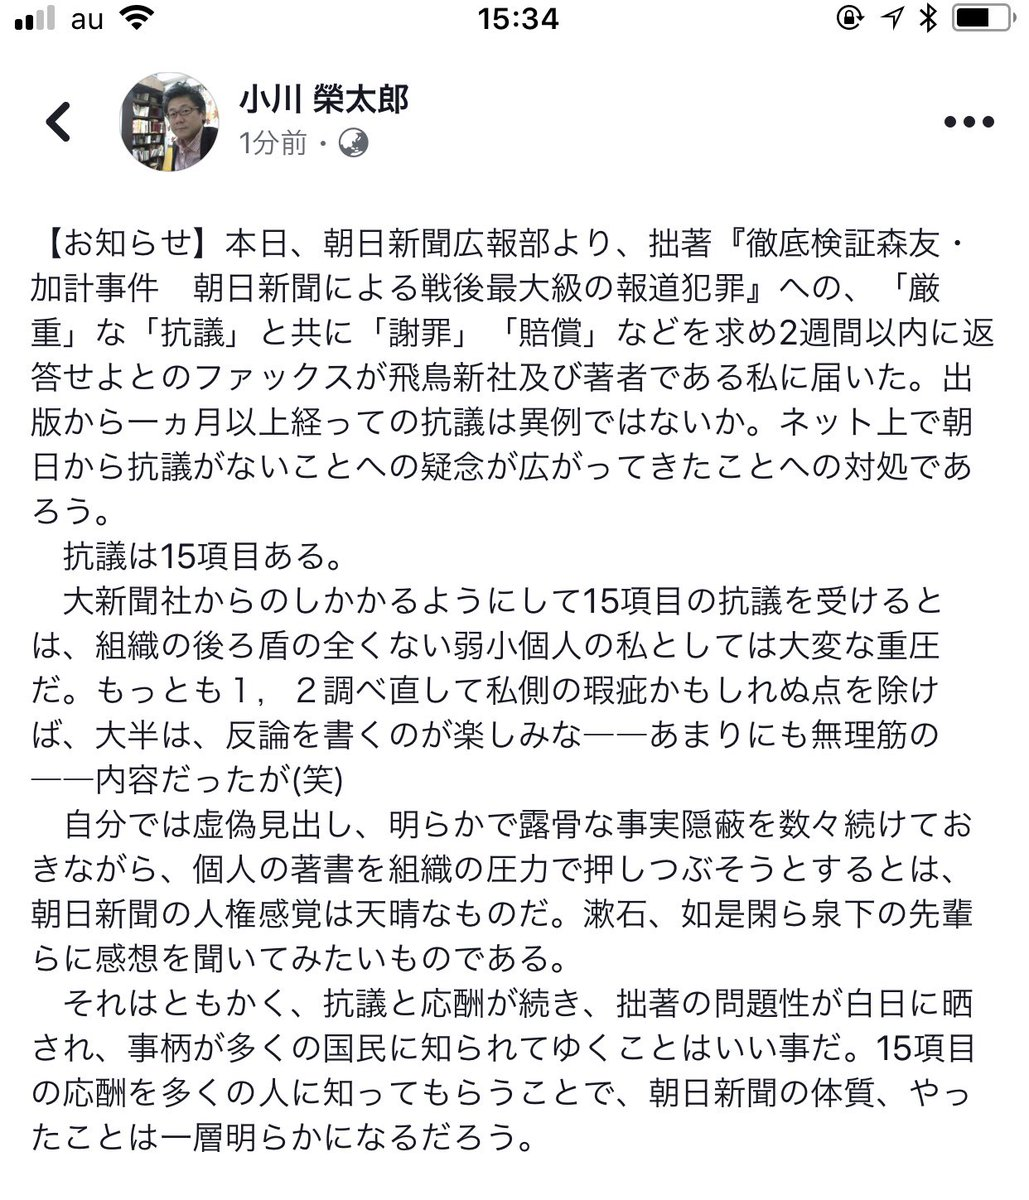 ogawa_tweet